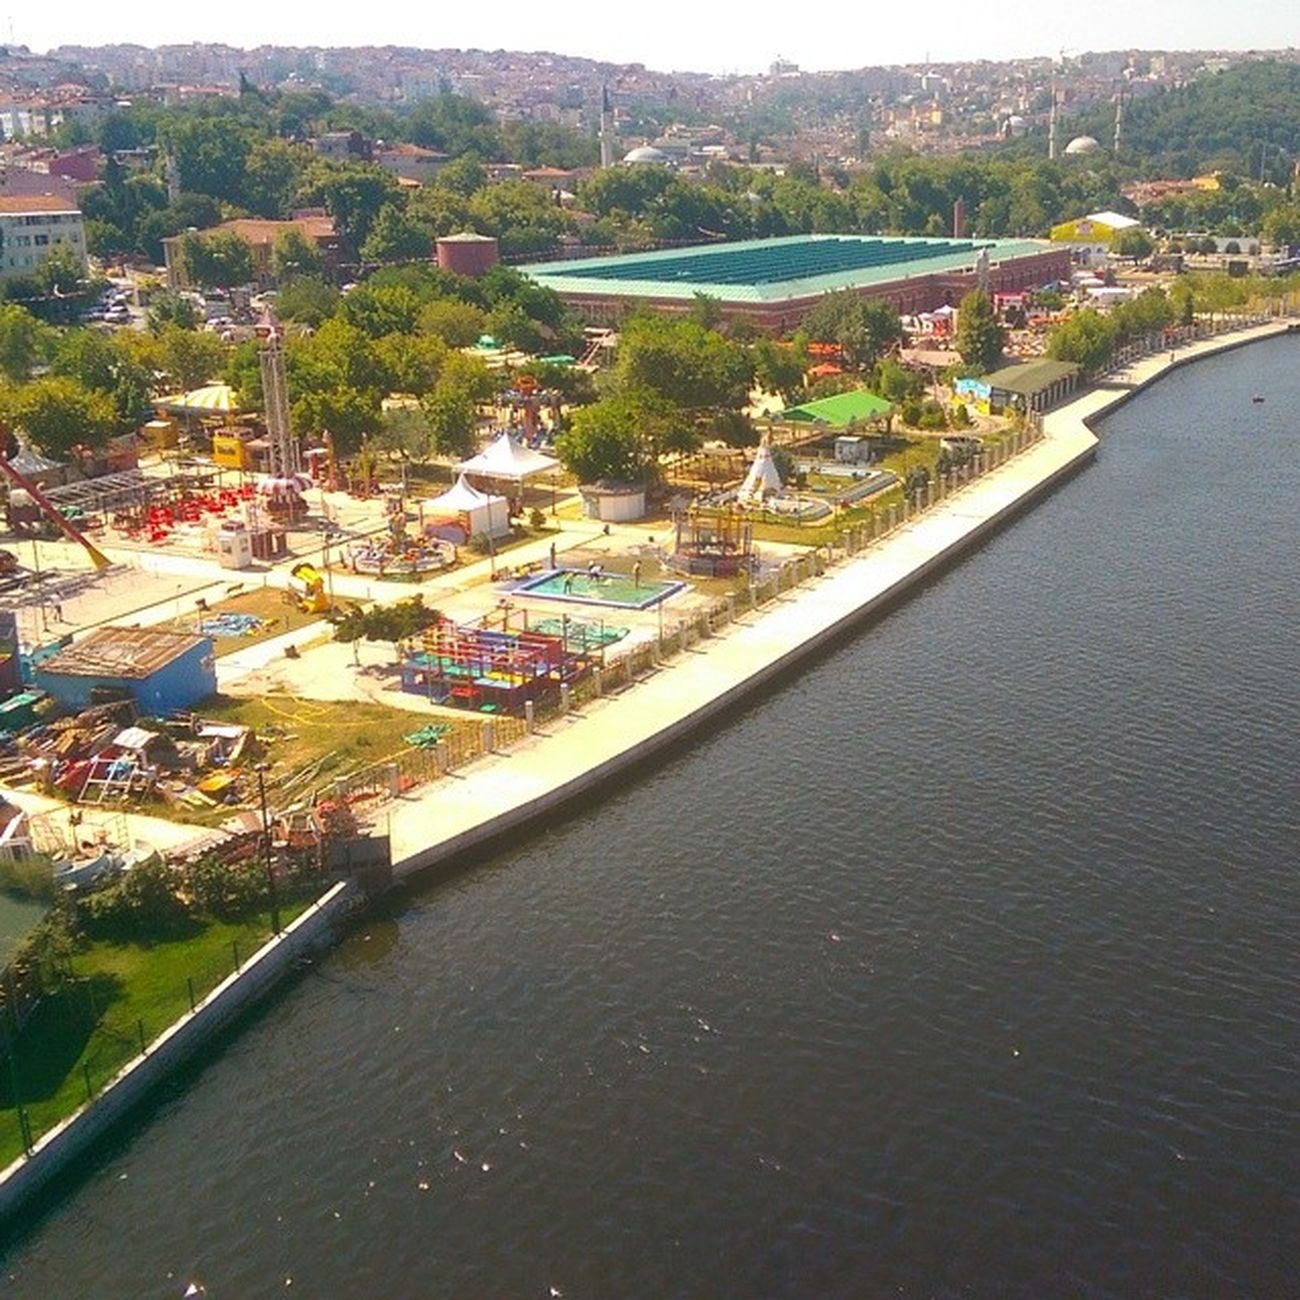 Eyüpsultan  Feshane Ramadan  Ramazan istanbul eyup city life halic goldenhorn nature manzara